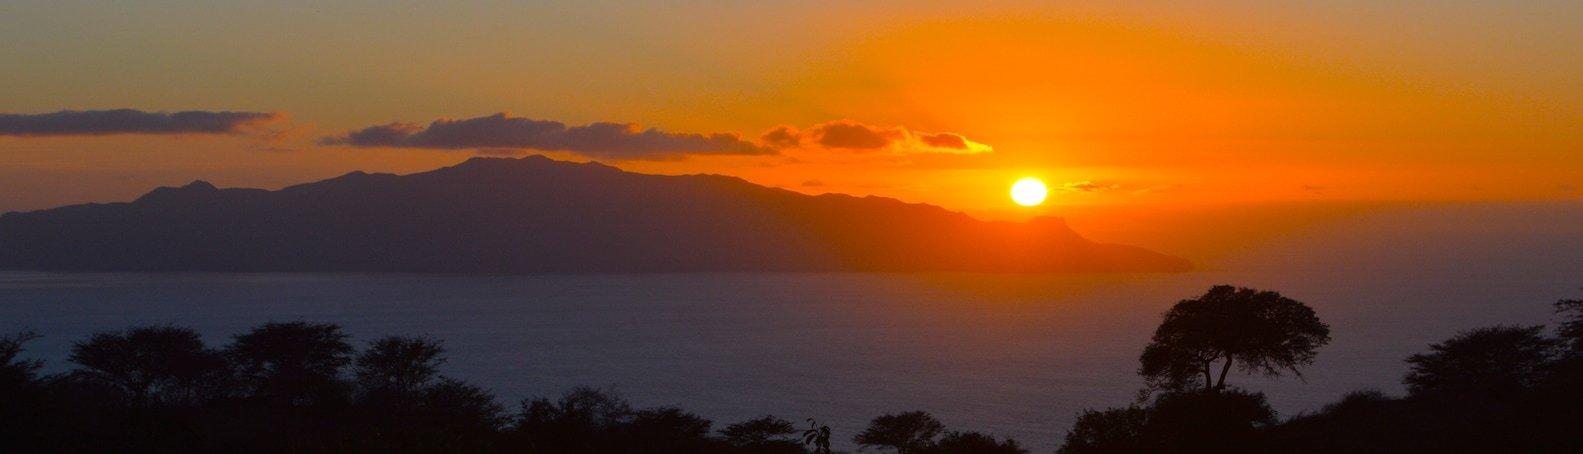 Cape Verde Fogo Island Sunset